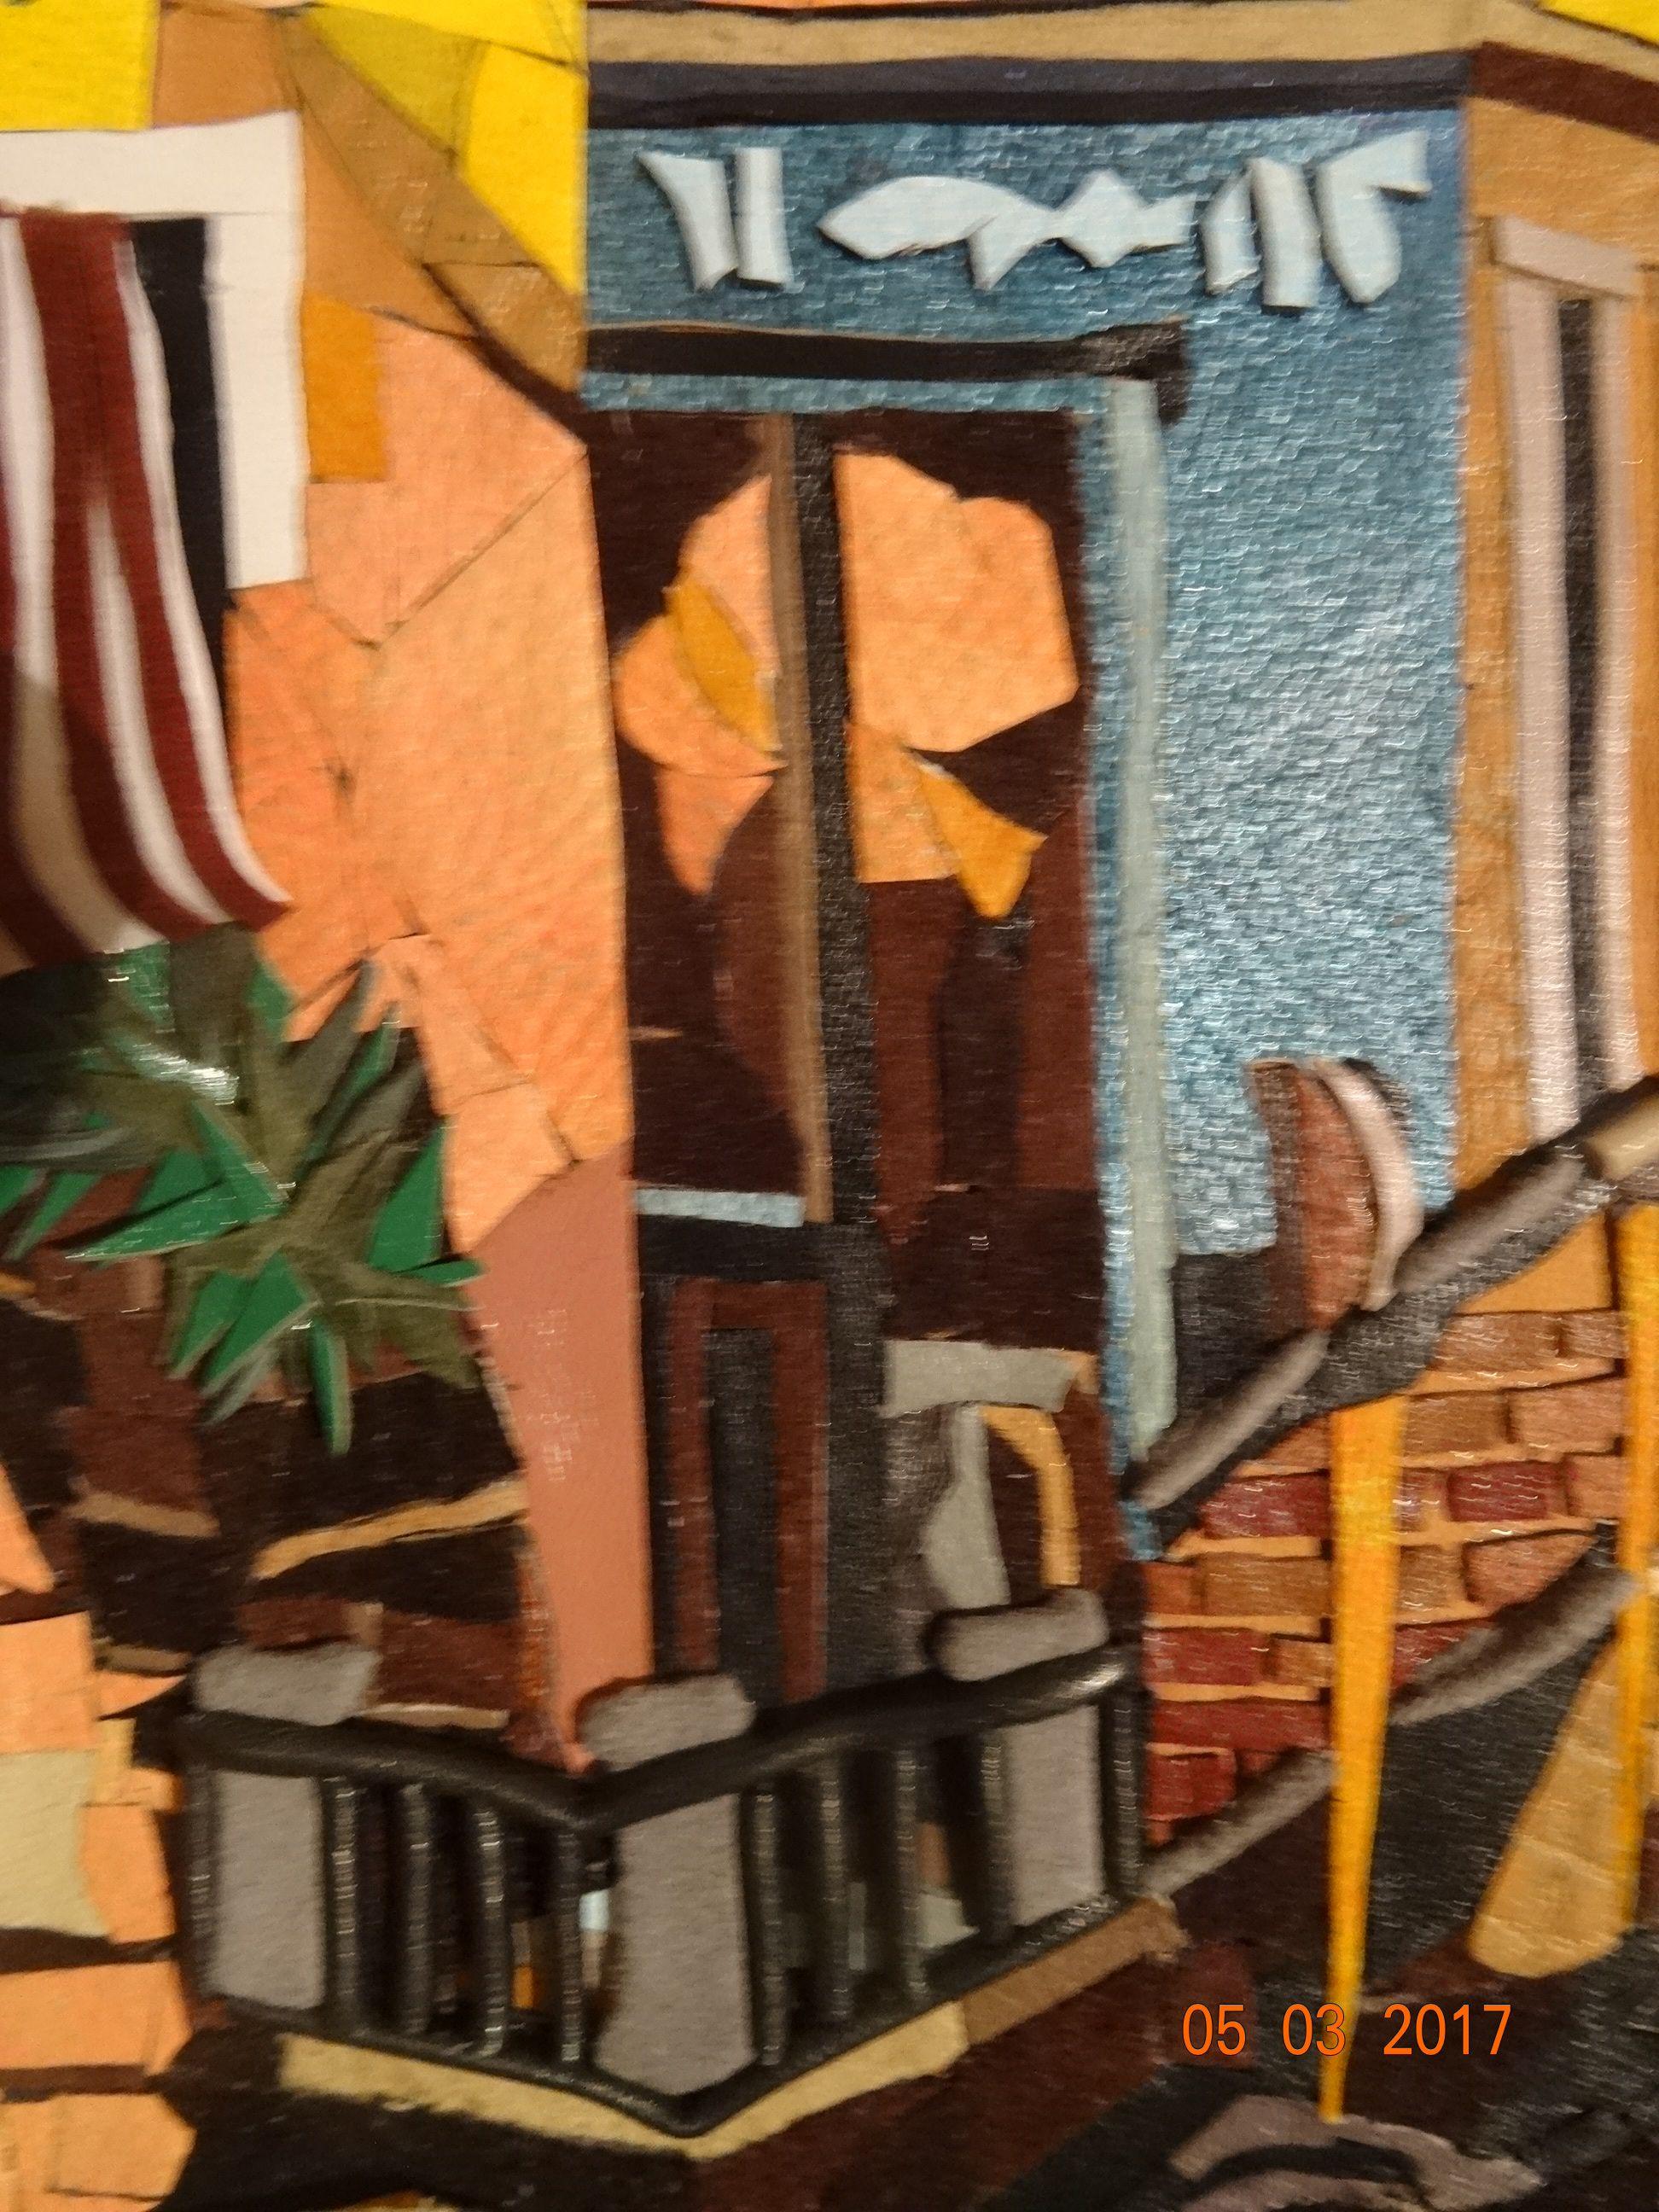 картинаизкожи мозаикаизкожи венеция италия мостывенеции